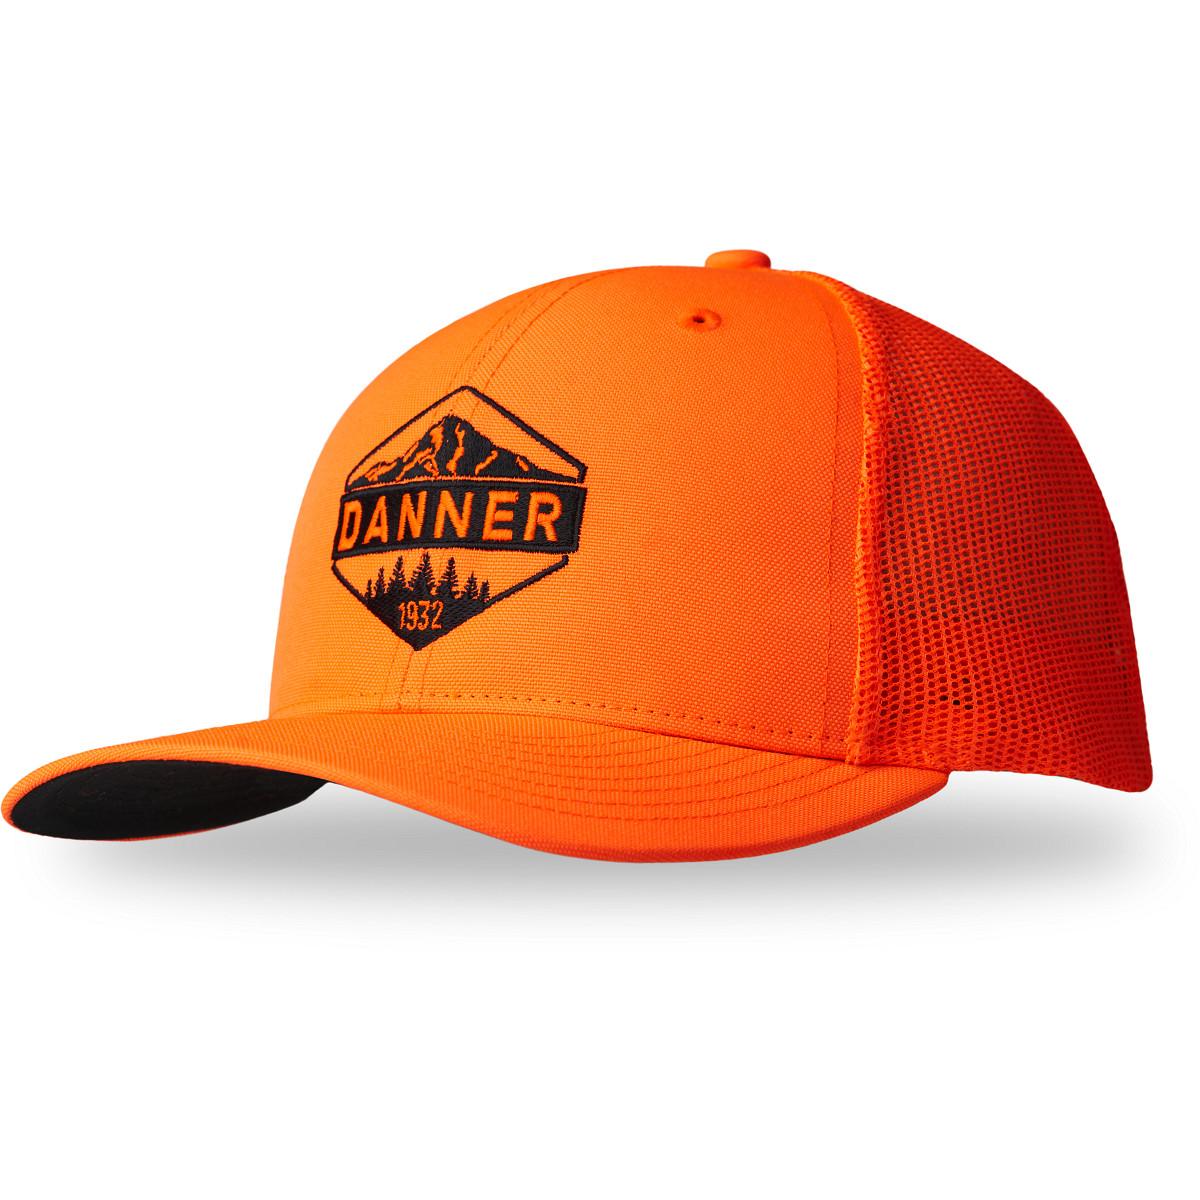 Danner Trucker - Blaze Orange